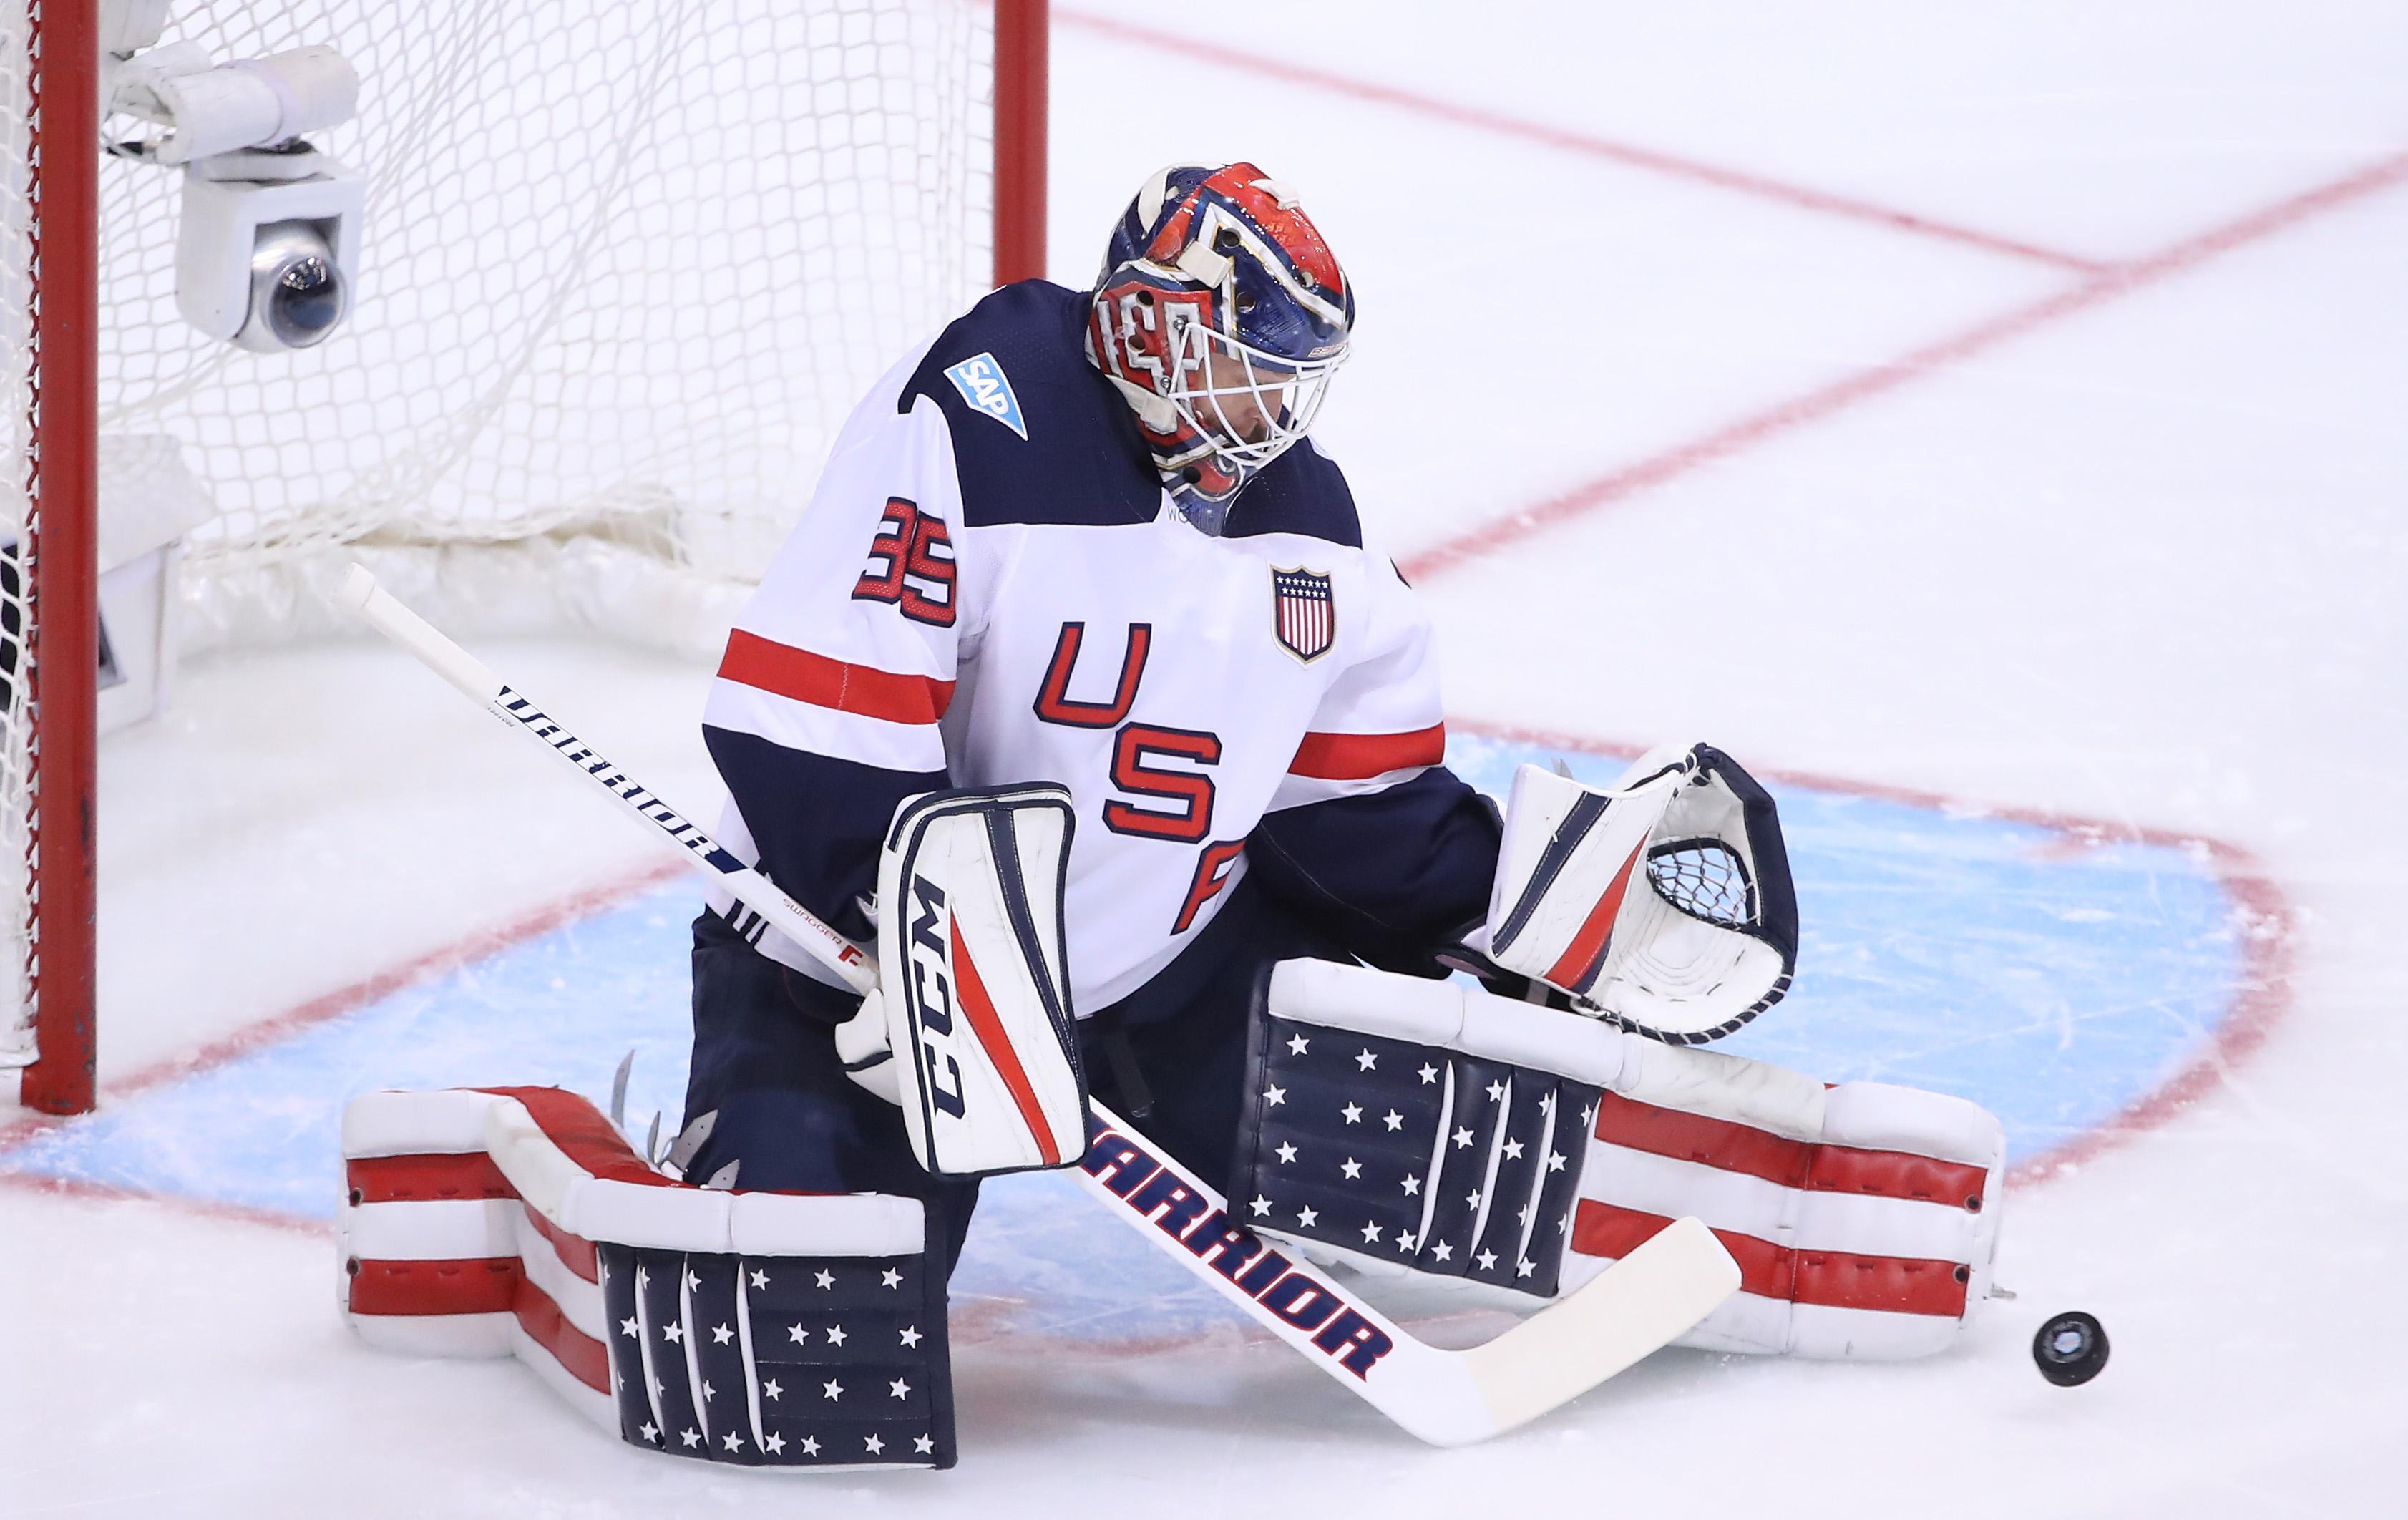 World Ice Hockey Championship is approaching